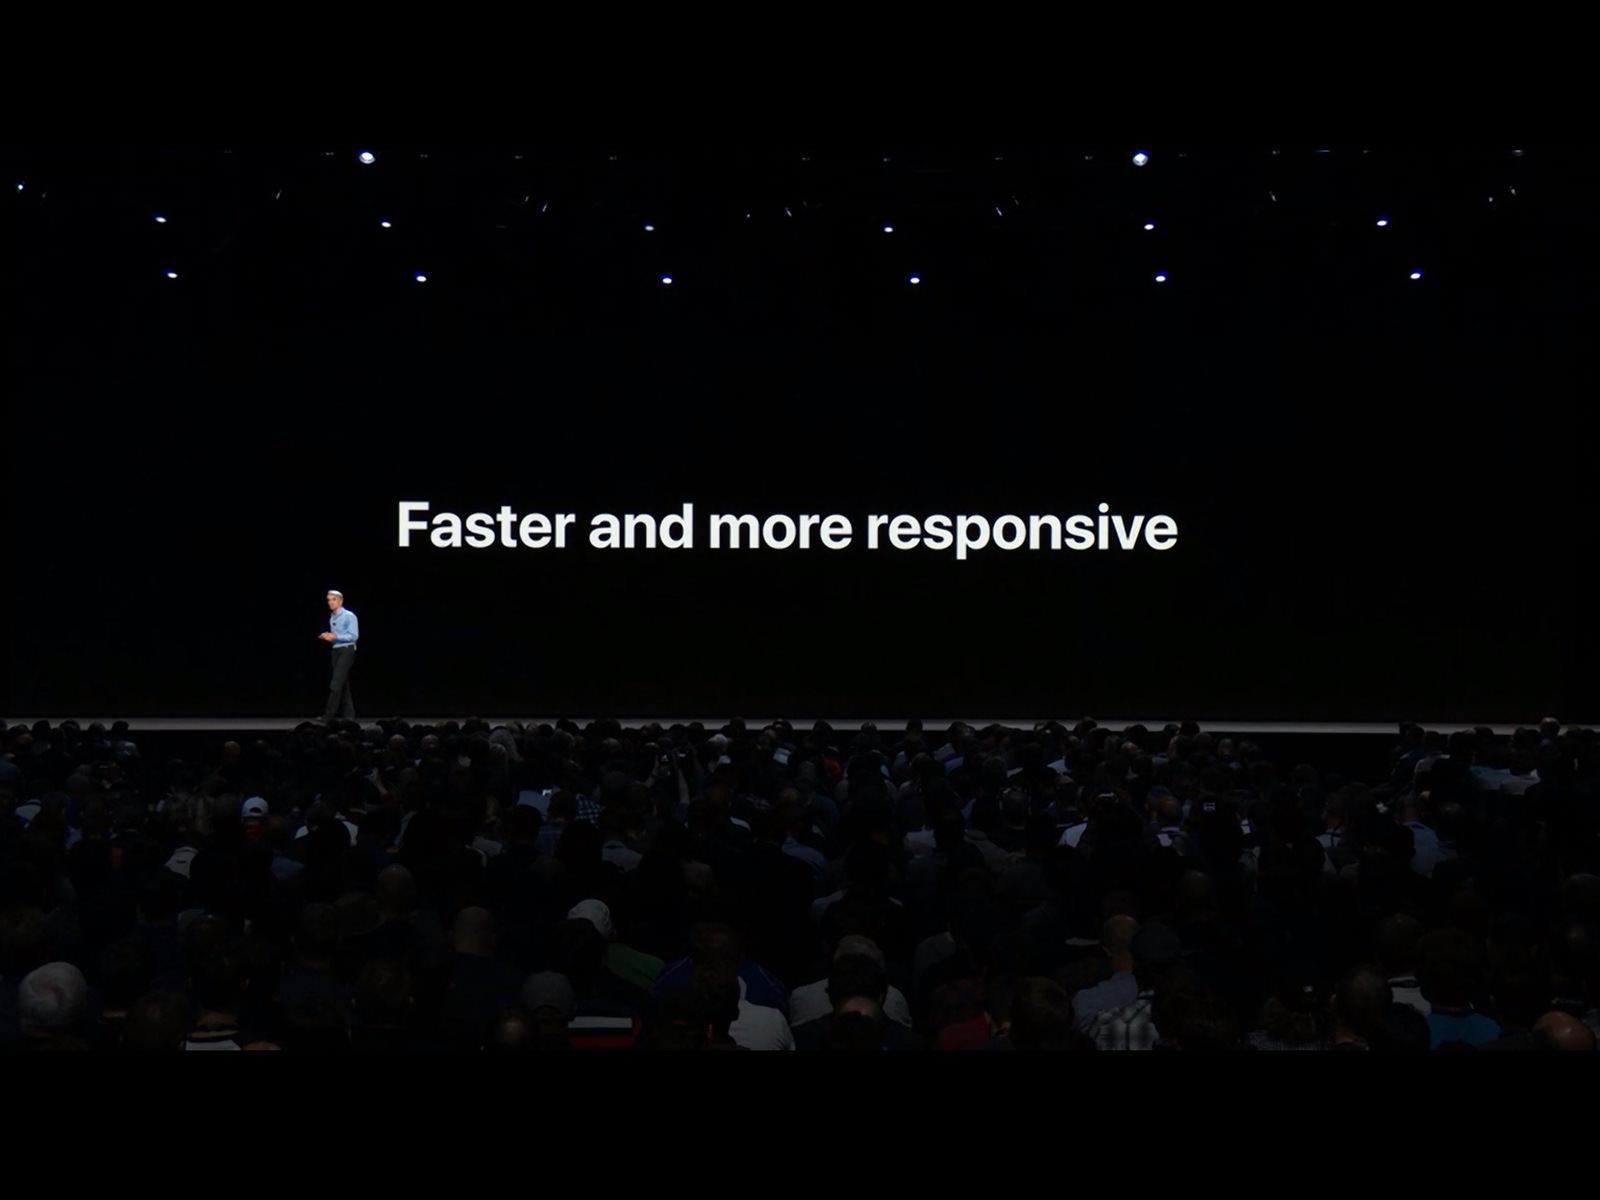 Preformance iOS12 05